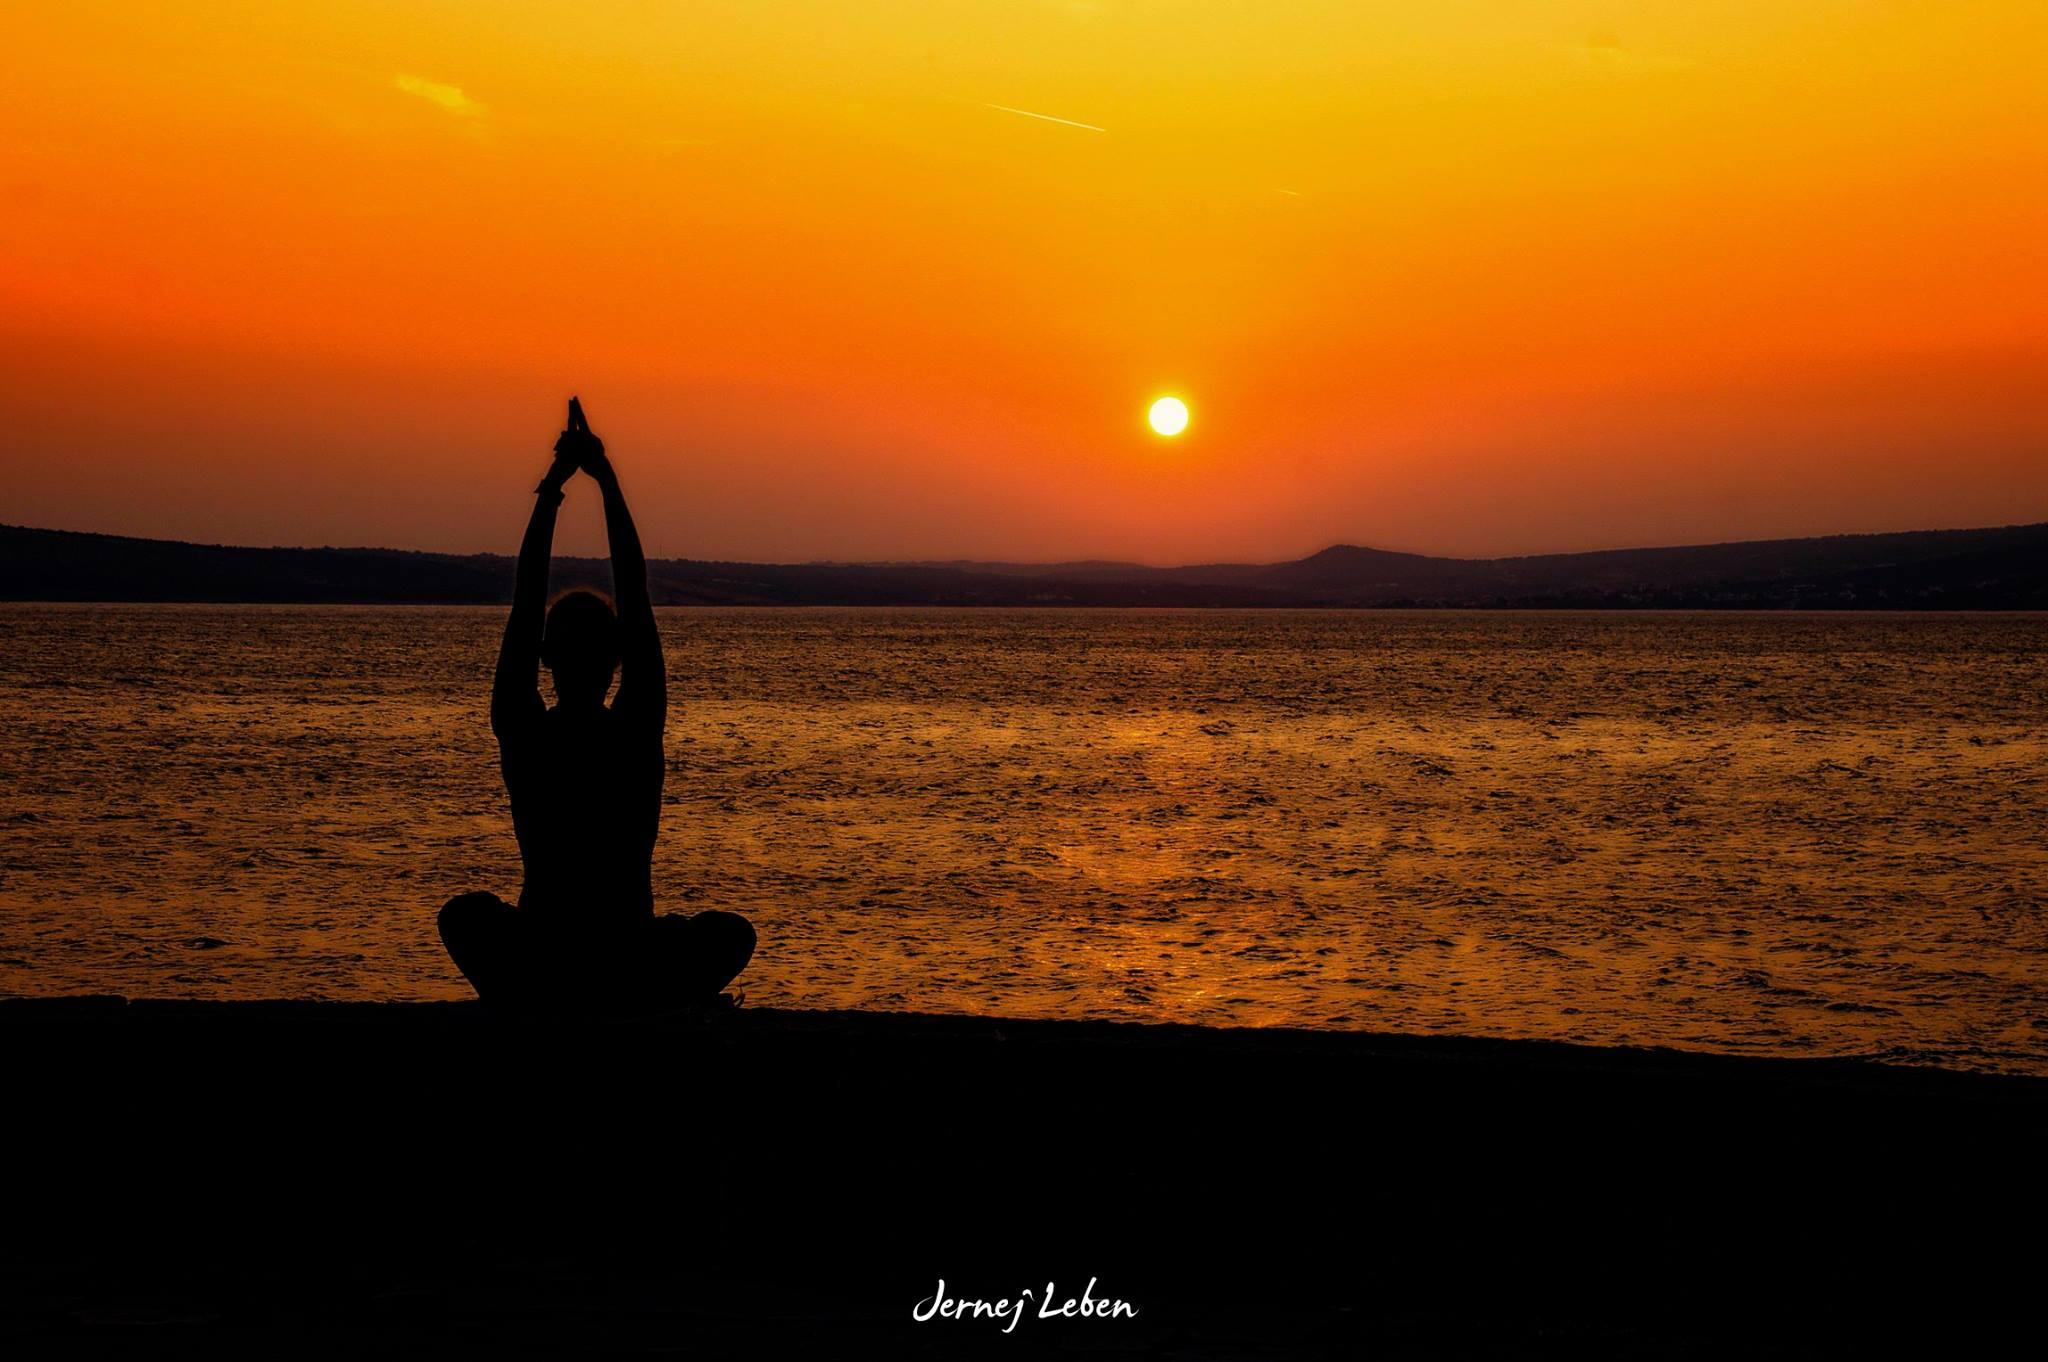 Različne smeri joge